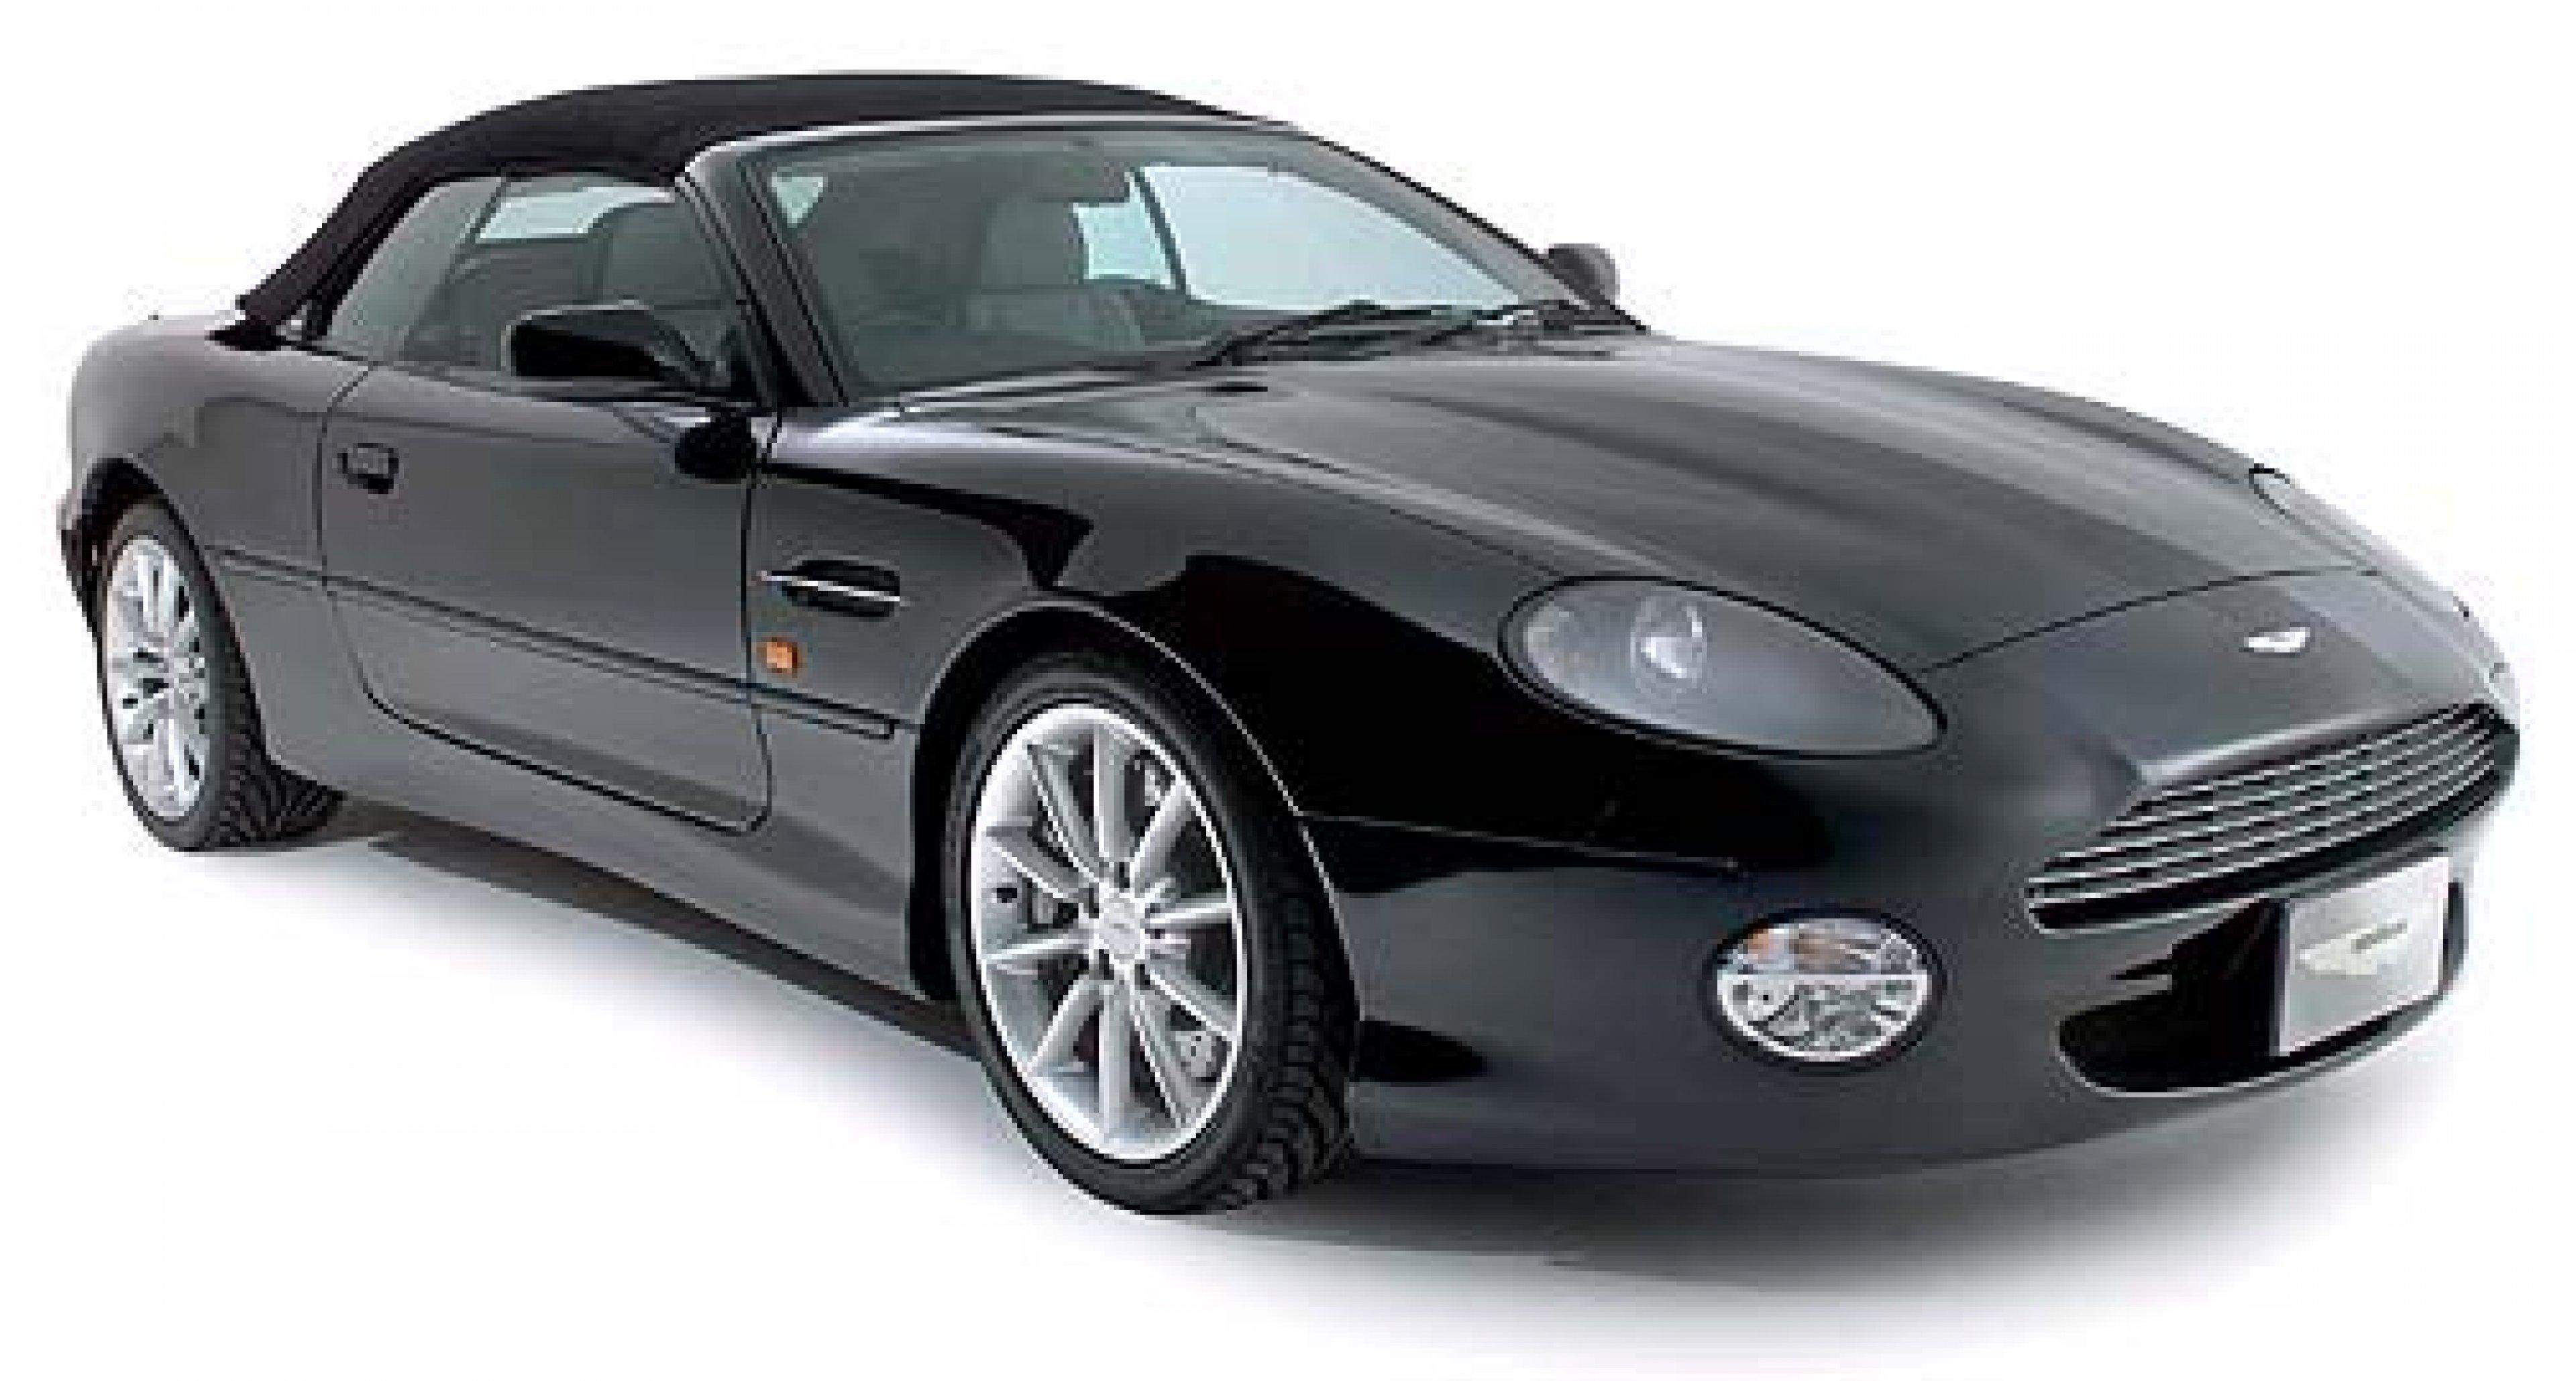 The Aston Martin DB7 - Grand Tourer